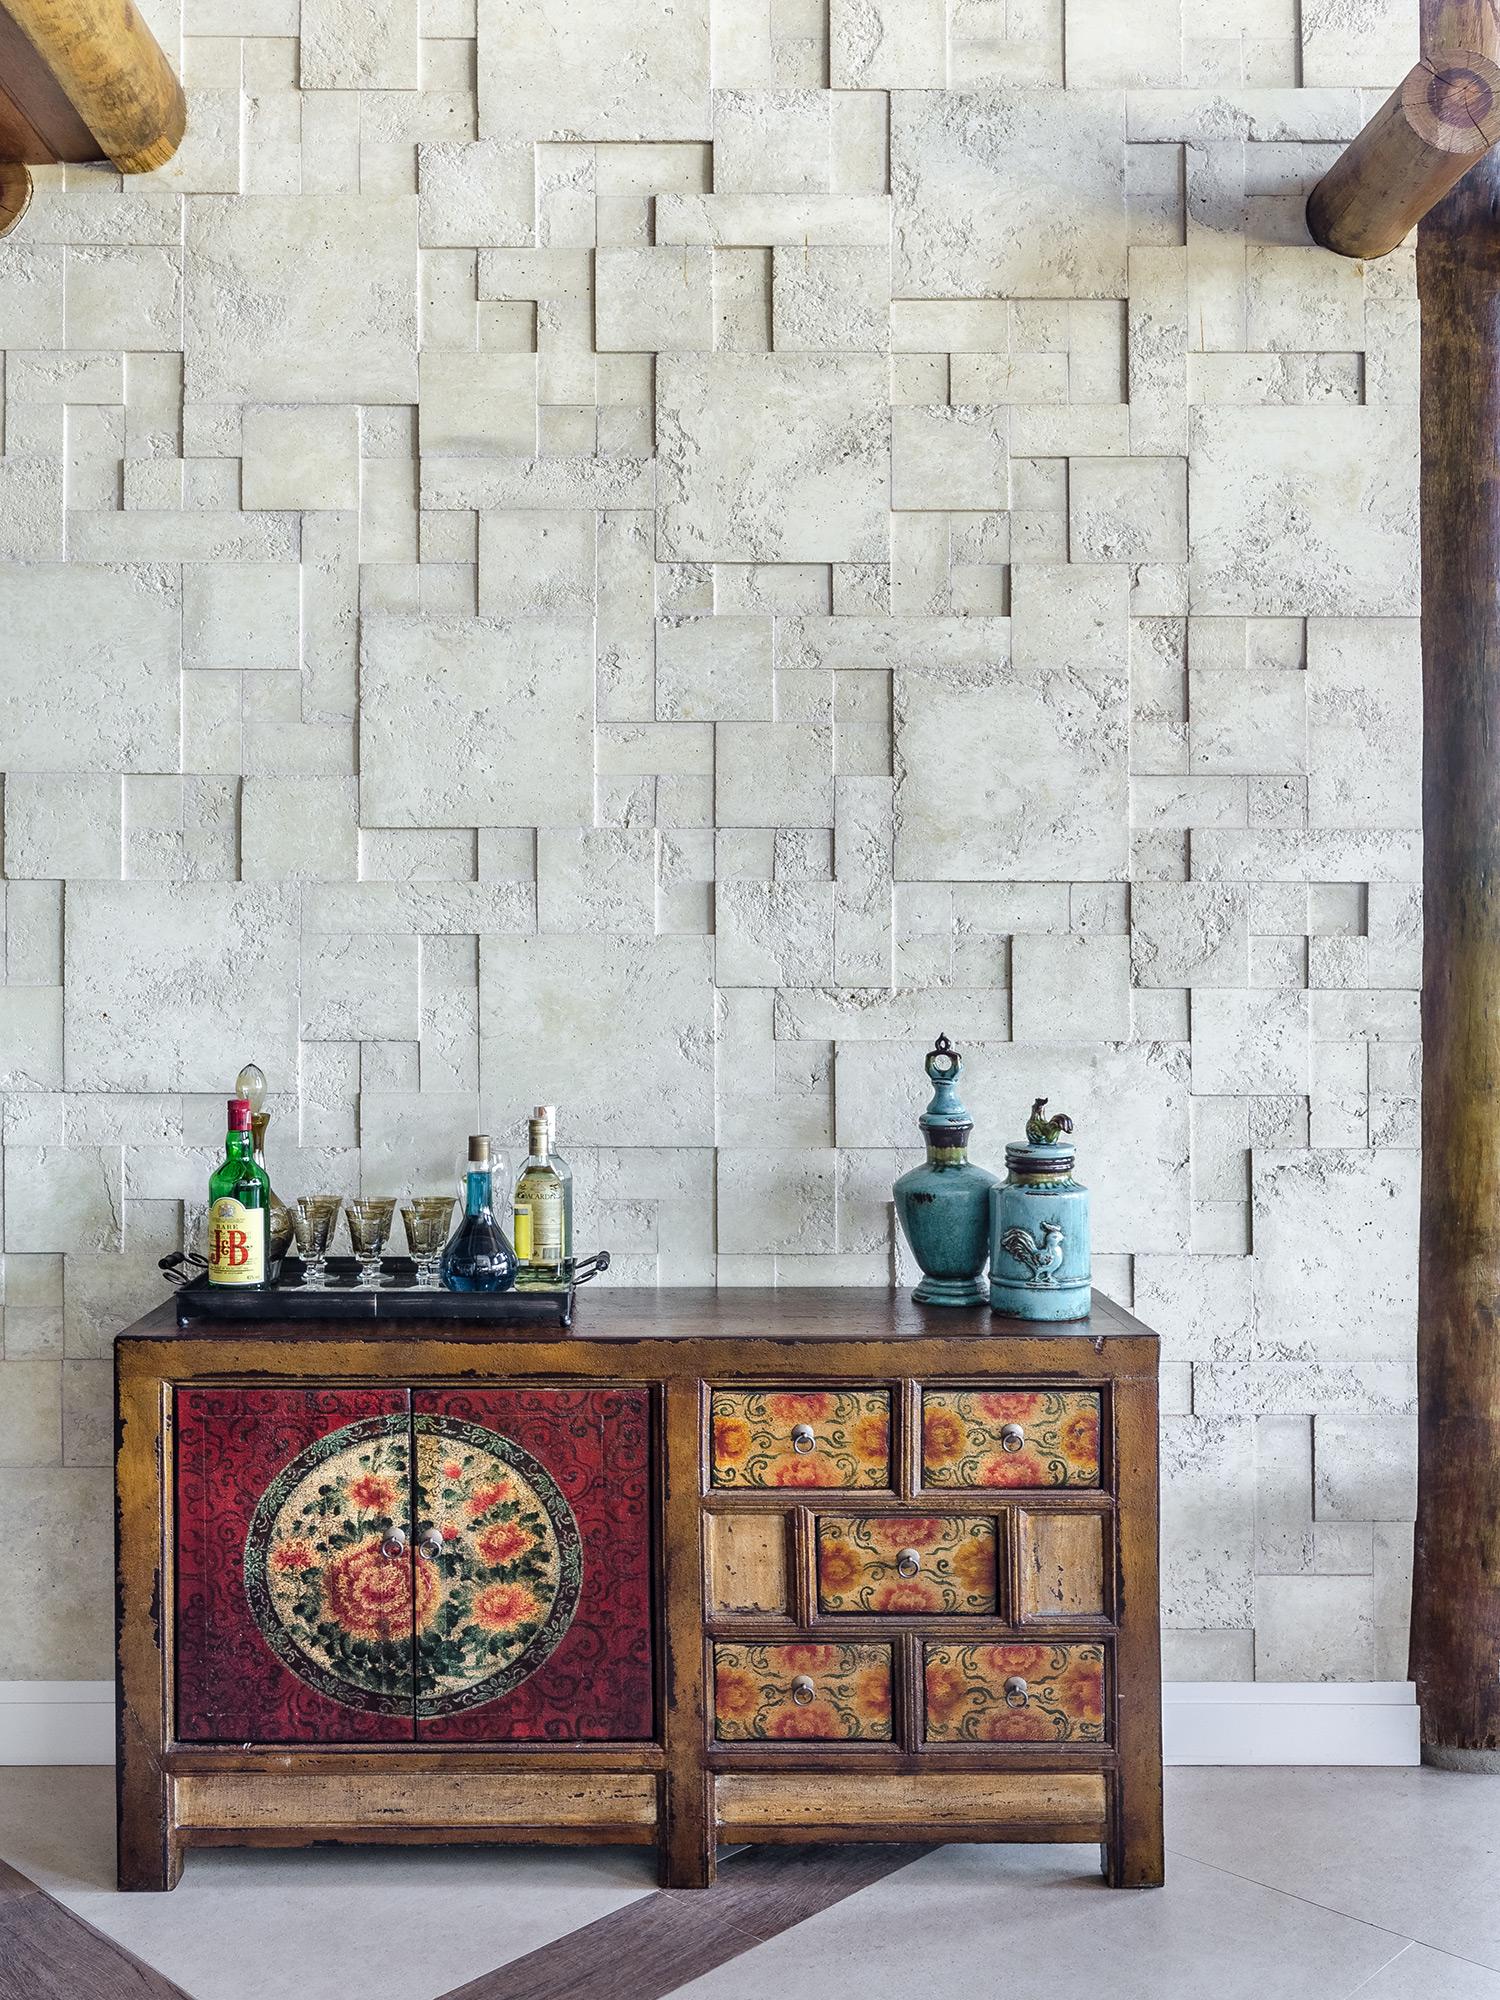 Mosaico Etrusco Fendi - Carvalho Arquitetos - Foto Ronaldo Rizzutti